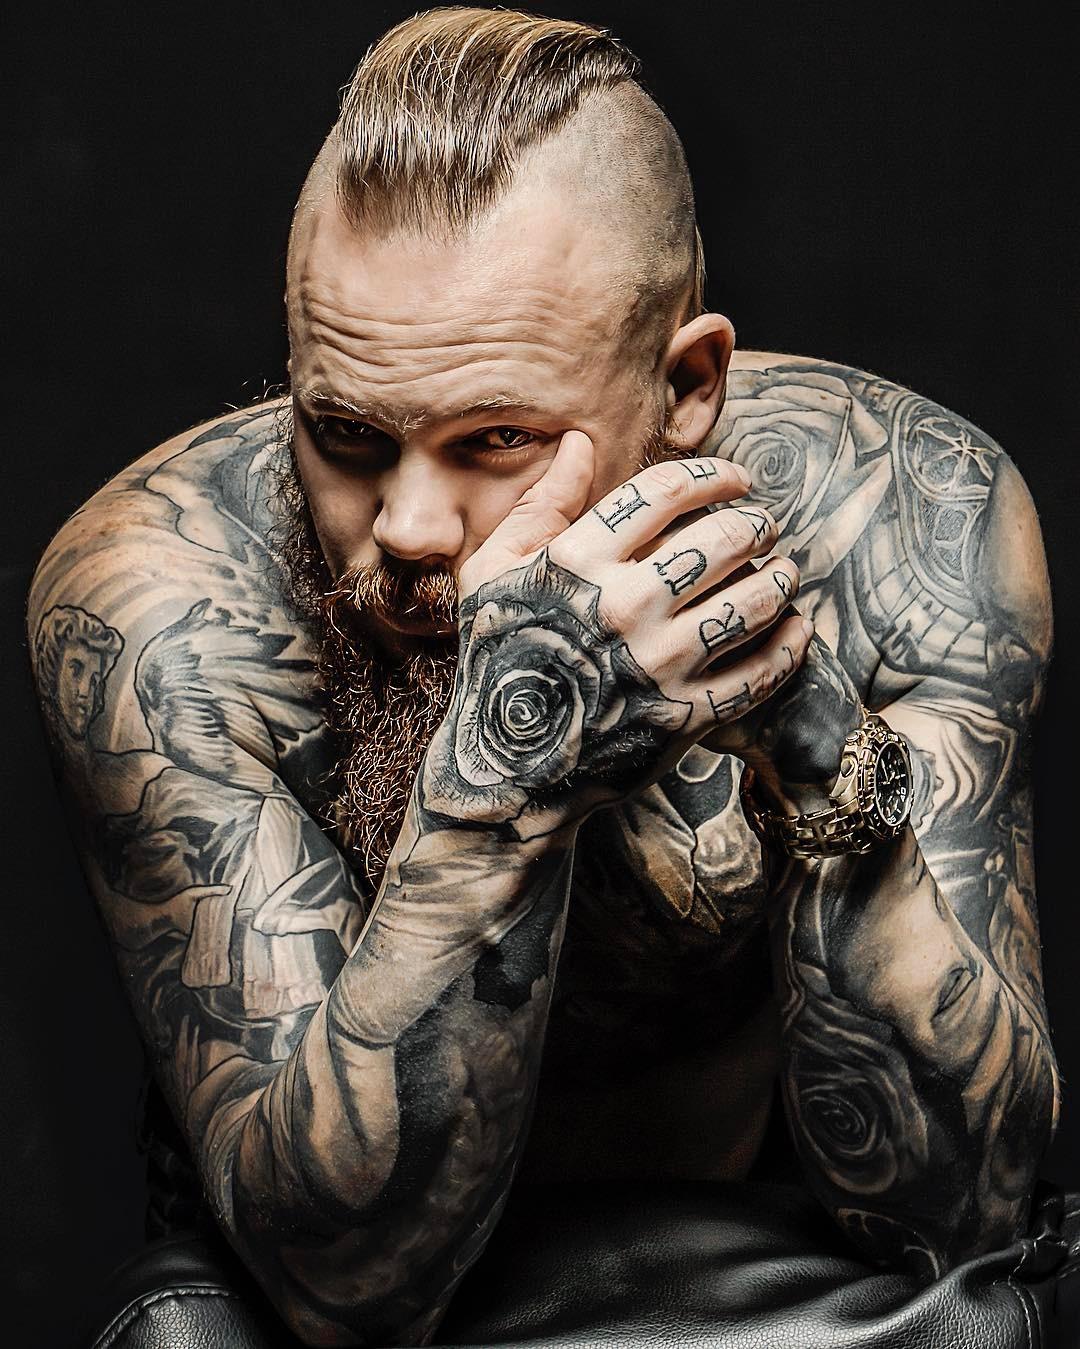 Designs Meanings 2019: 110+ Best Guardian Angel Tattoos